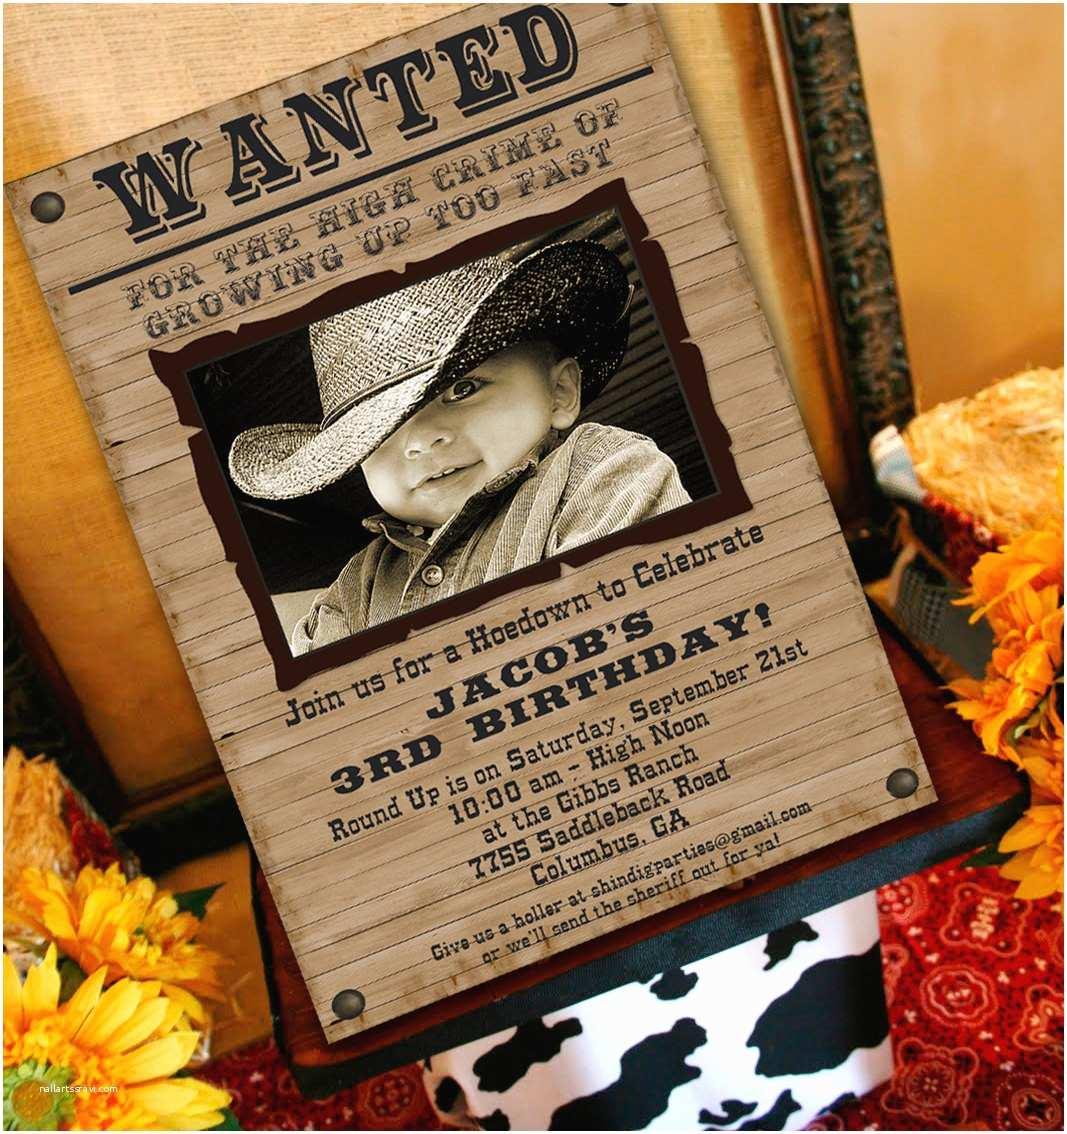 Cowgirl Party Invitations Cowboy Party Invitation Cowboy Western by Amandaspartiestogo